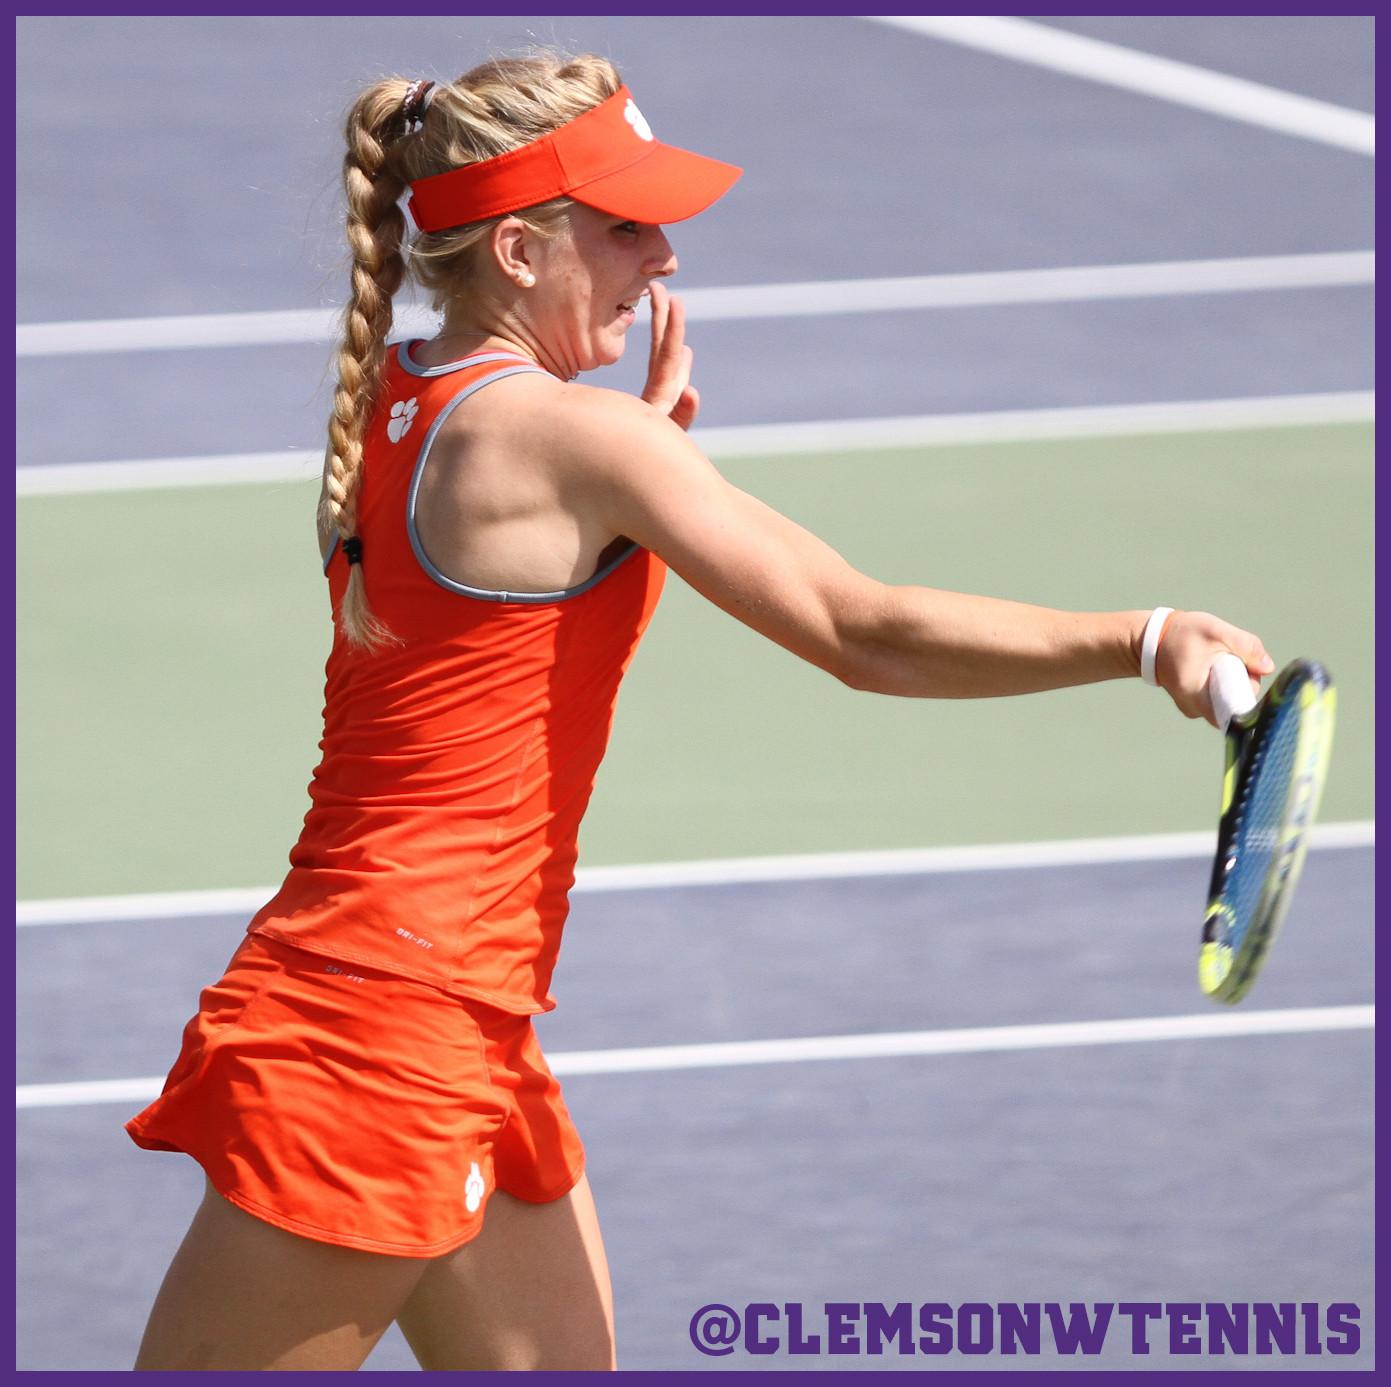 Eidukonyte Advances to Singles Final at ITA Carolina Regional